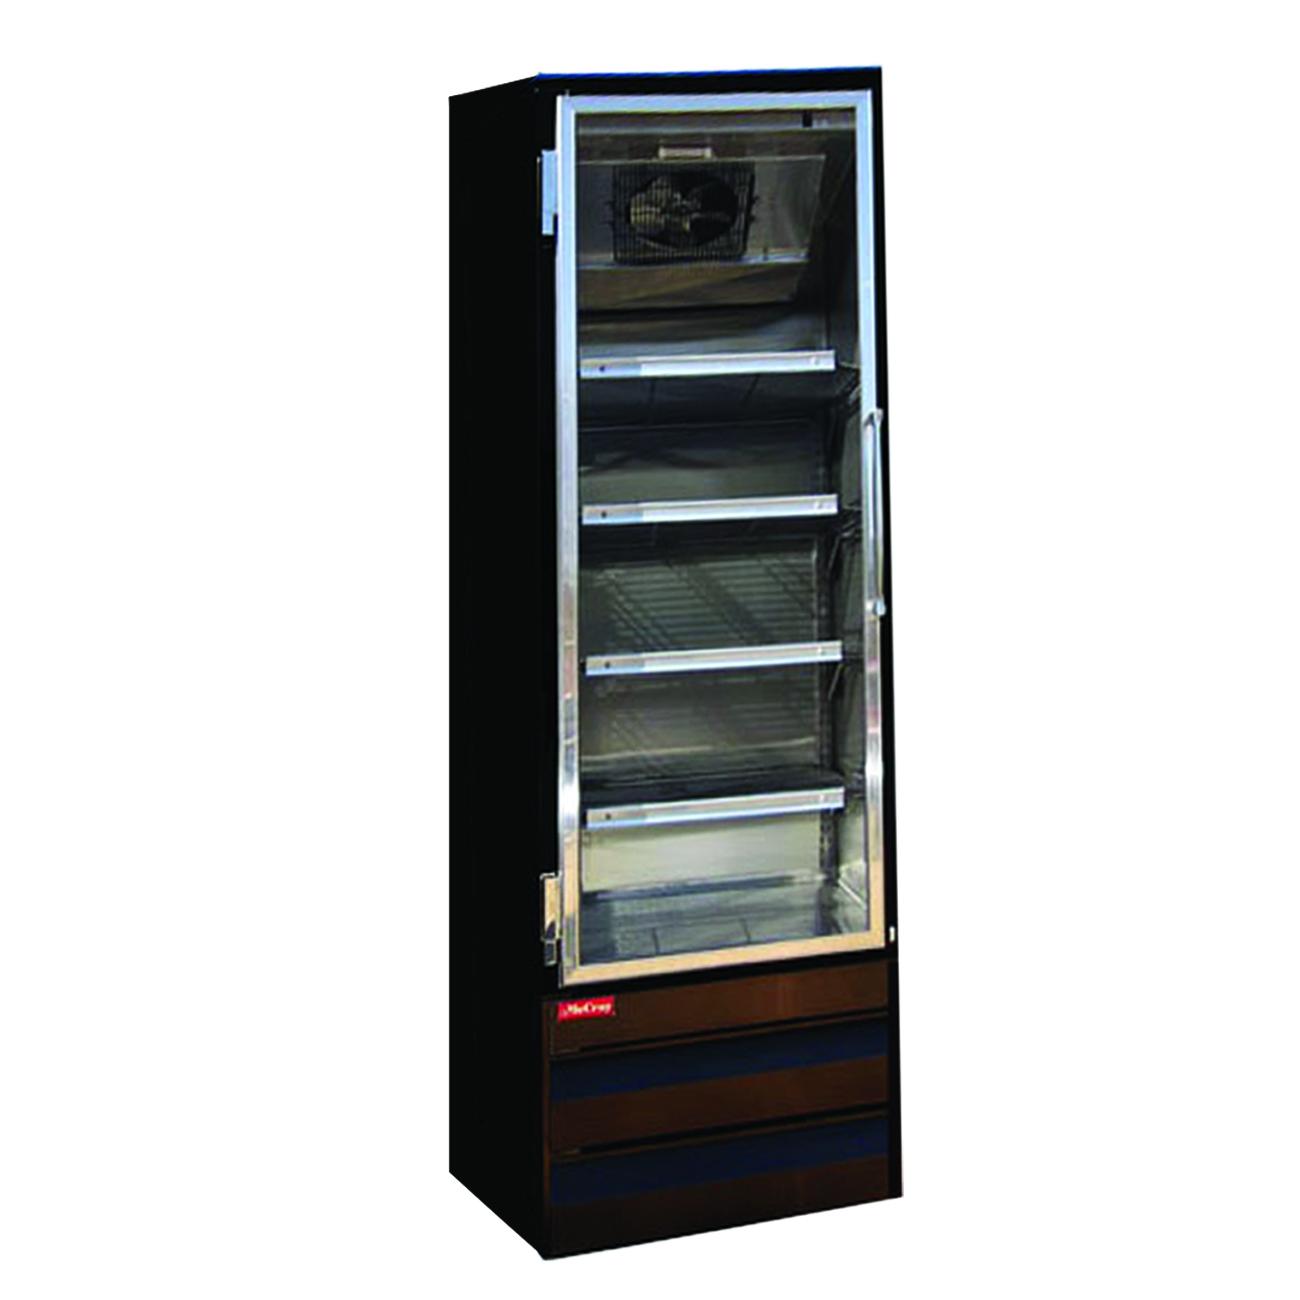 Howard-McCray GF22BM-FF freezer, merchandiser